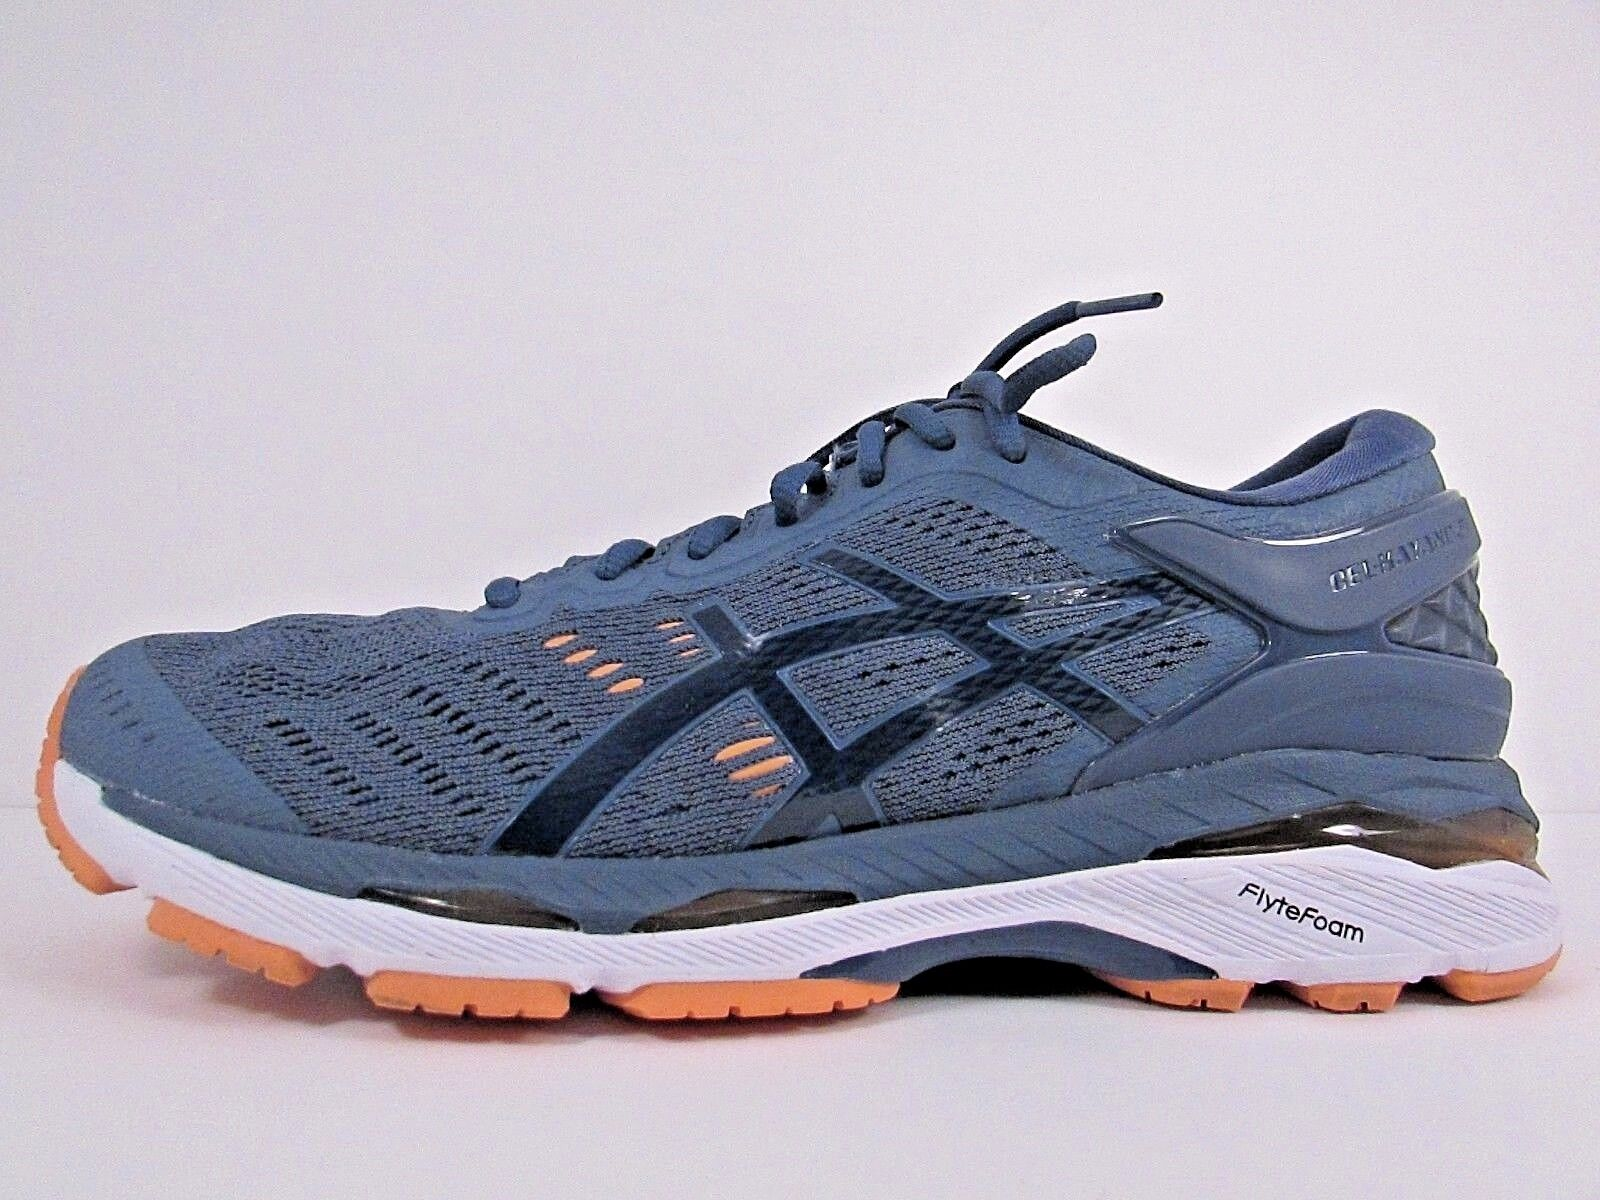 WOMEN'S ASICS GEL KAYANO 24 Größe 10  WORN LESS THAN 20 MILES  RUNNING Schuhe